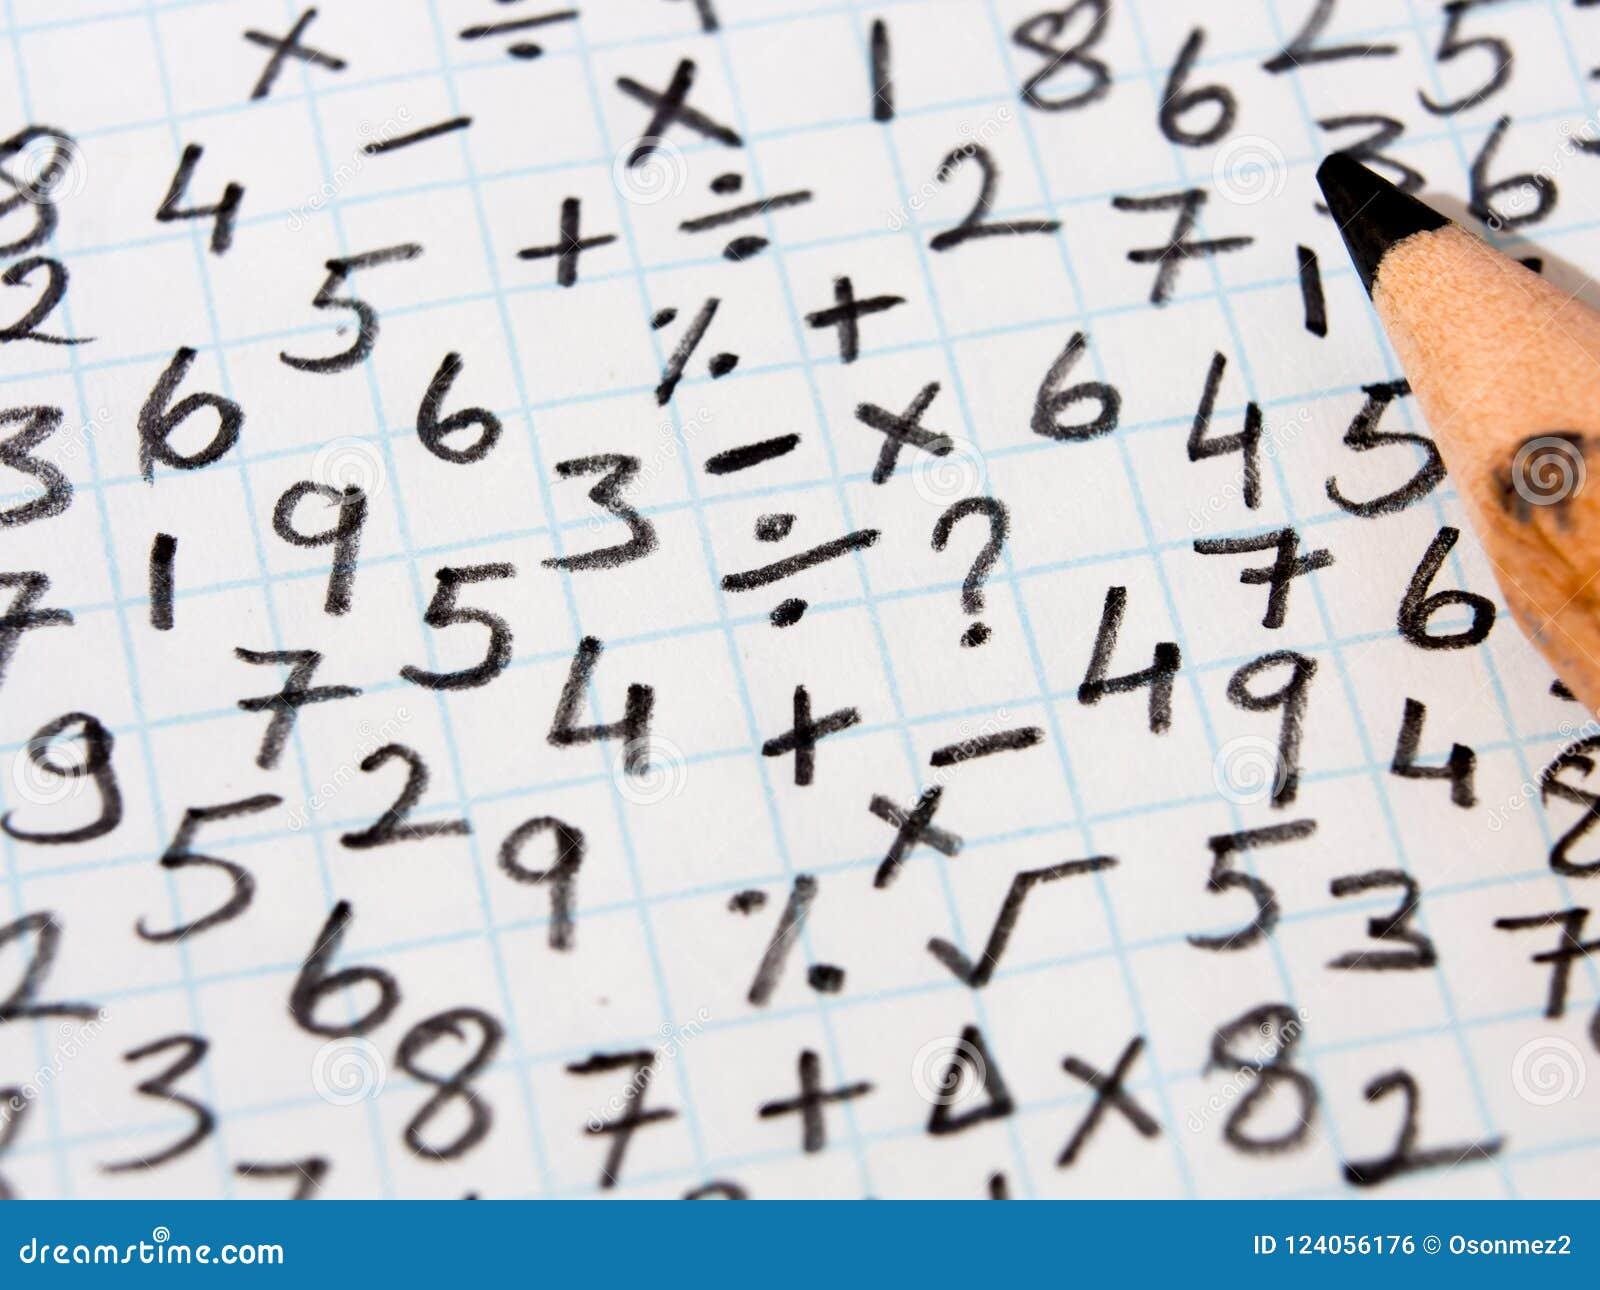 Математически символы и решение проблем